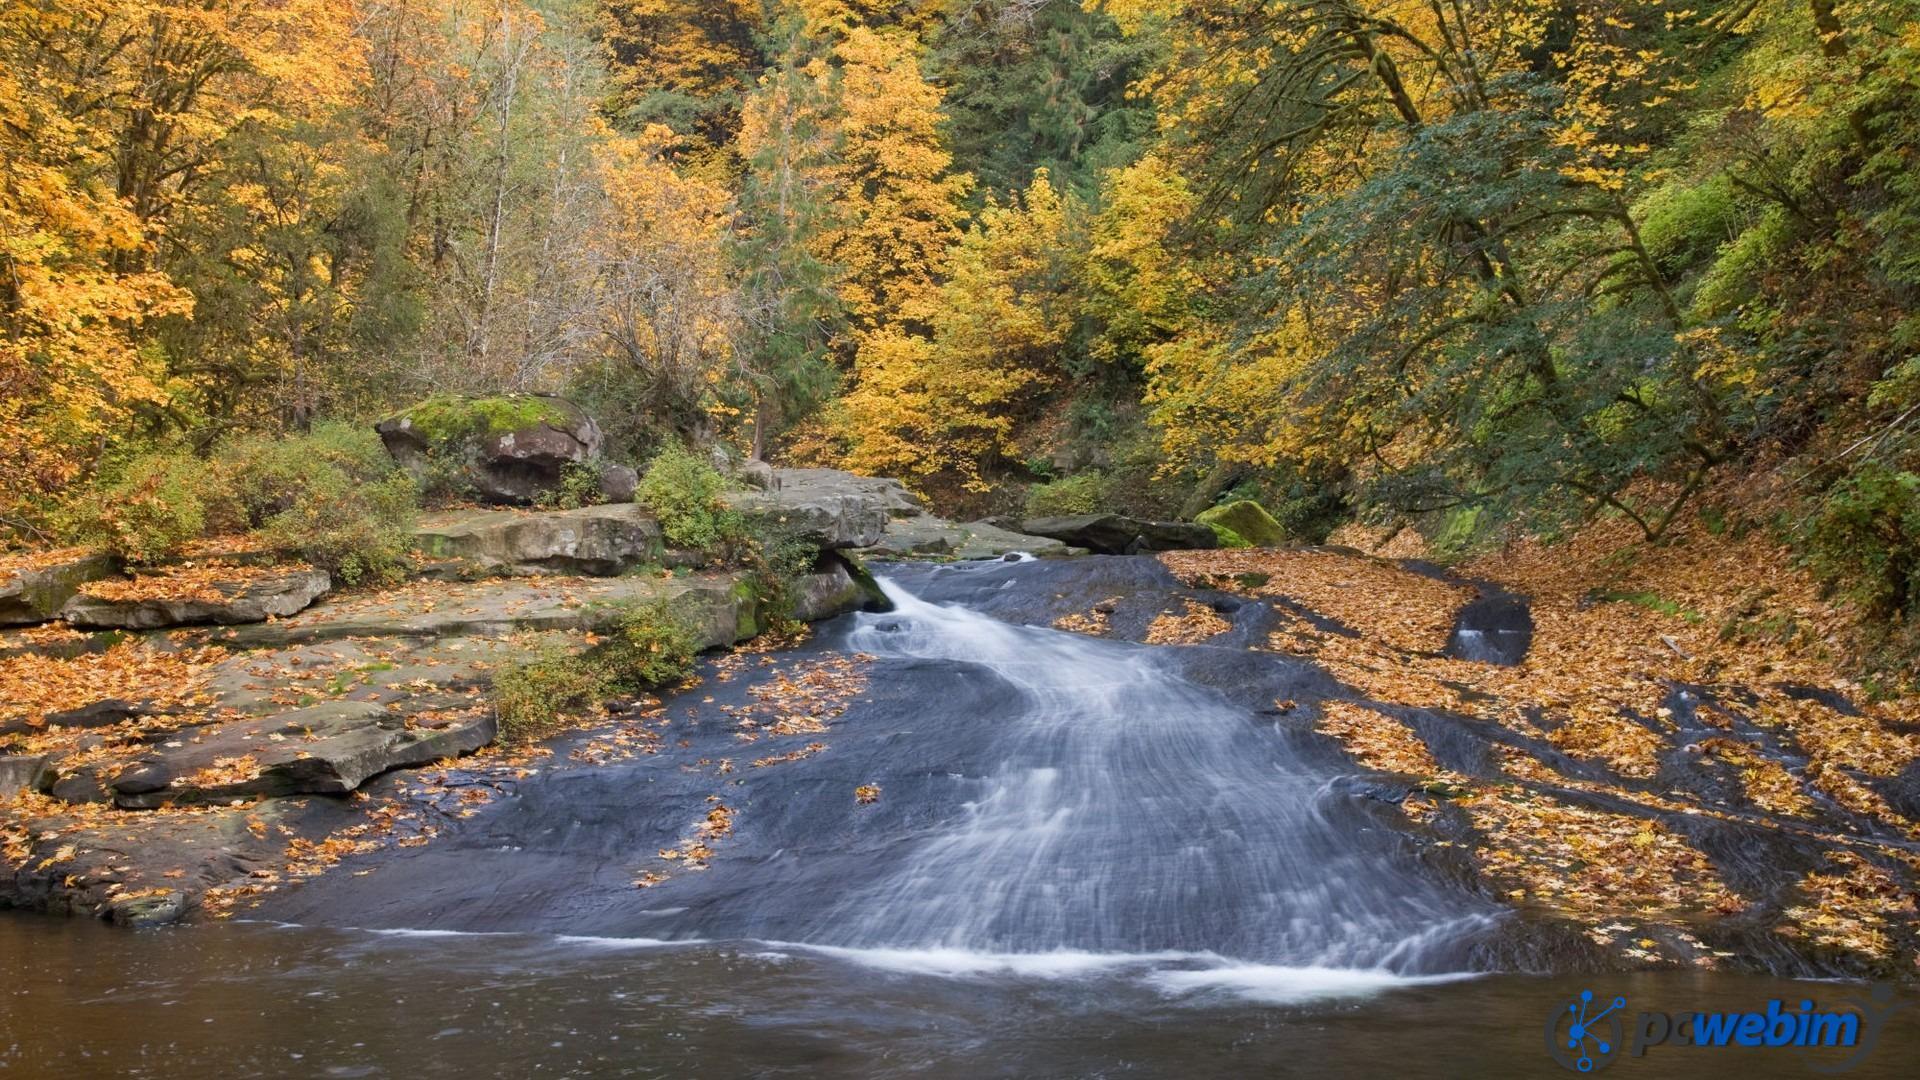 USA; Oregon; Lake Creek; fall color- Credit as: Don Paulson, www.donpaulson.com